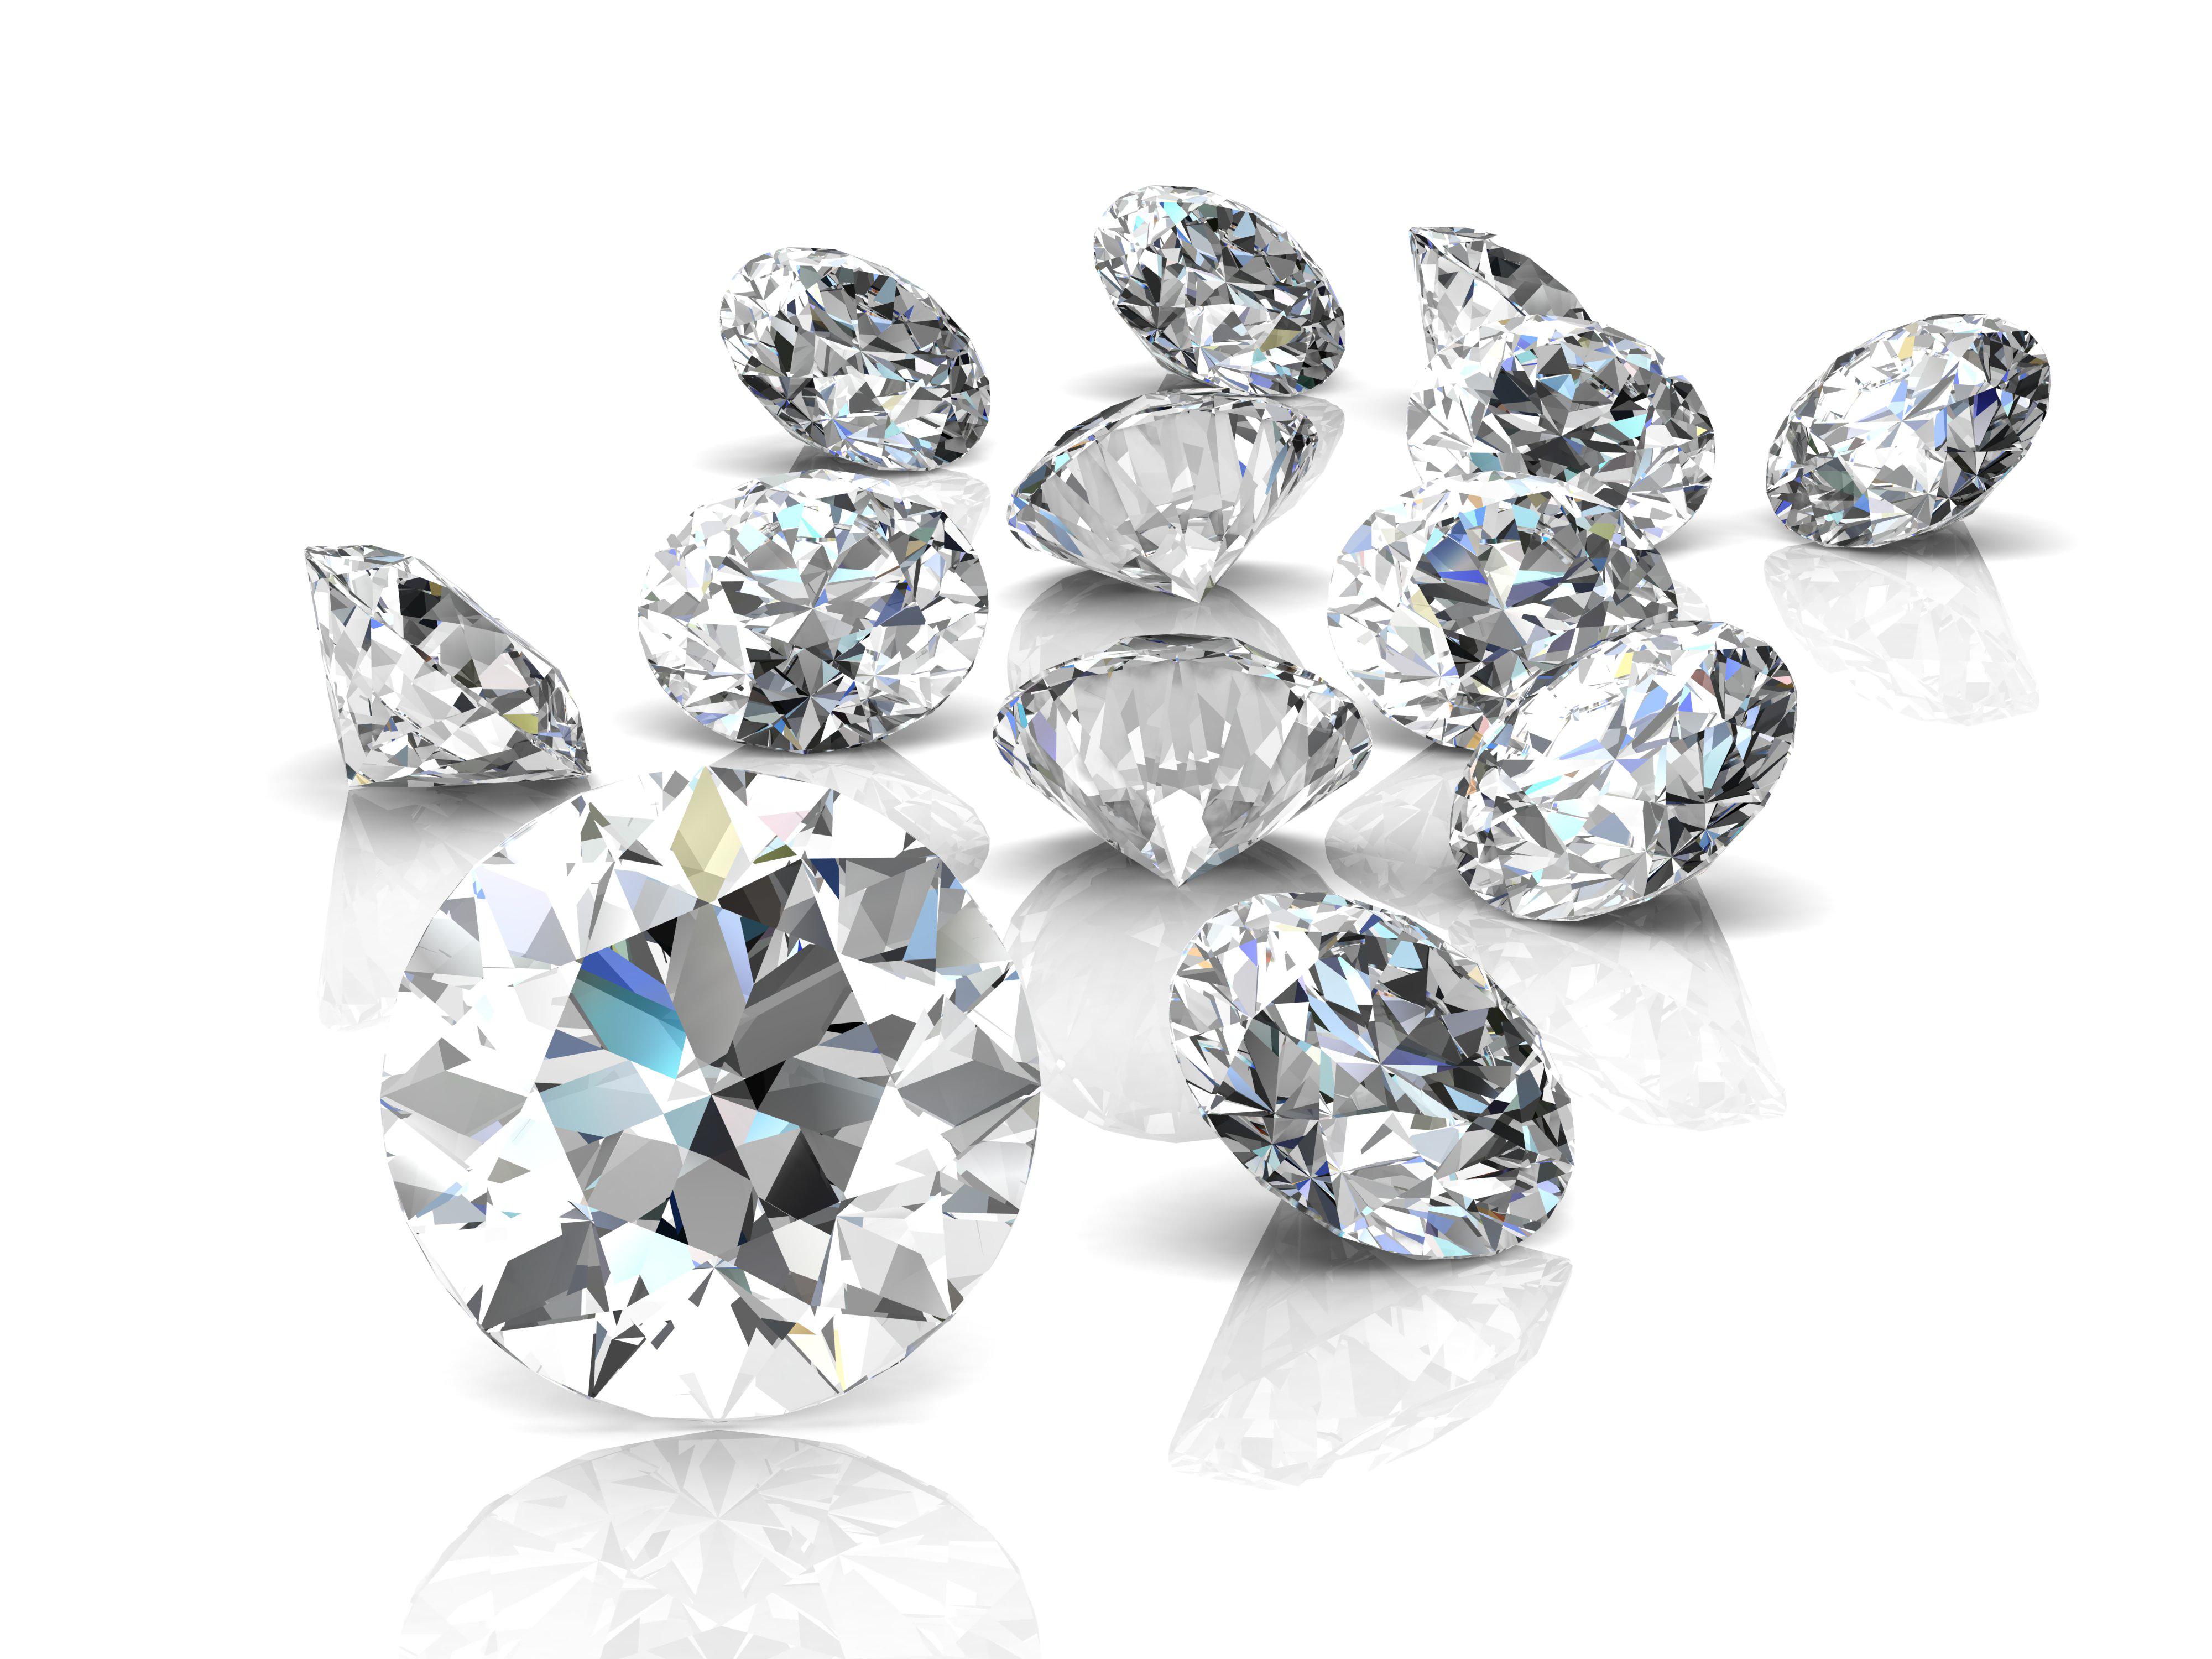 Diamond Simulants Course, Birmingham Assay Office